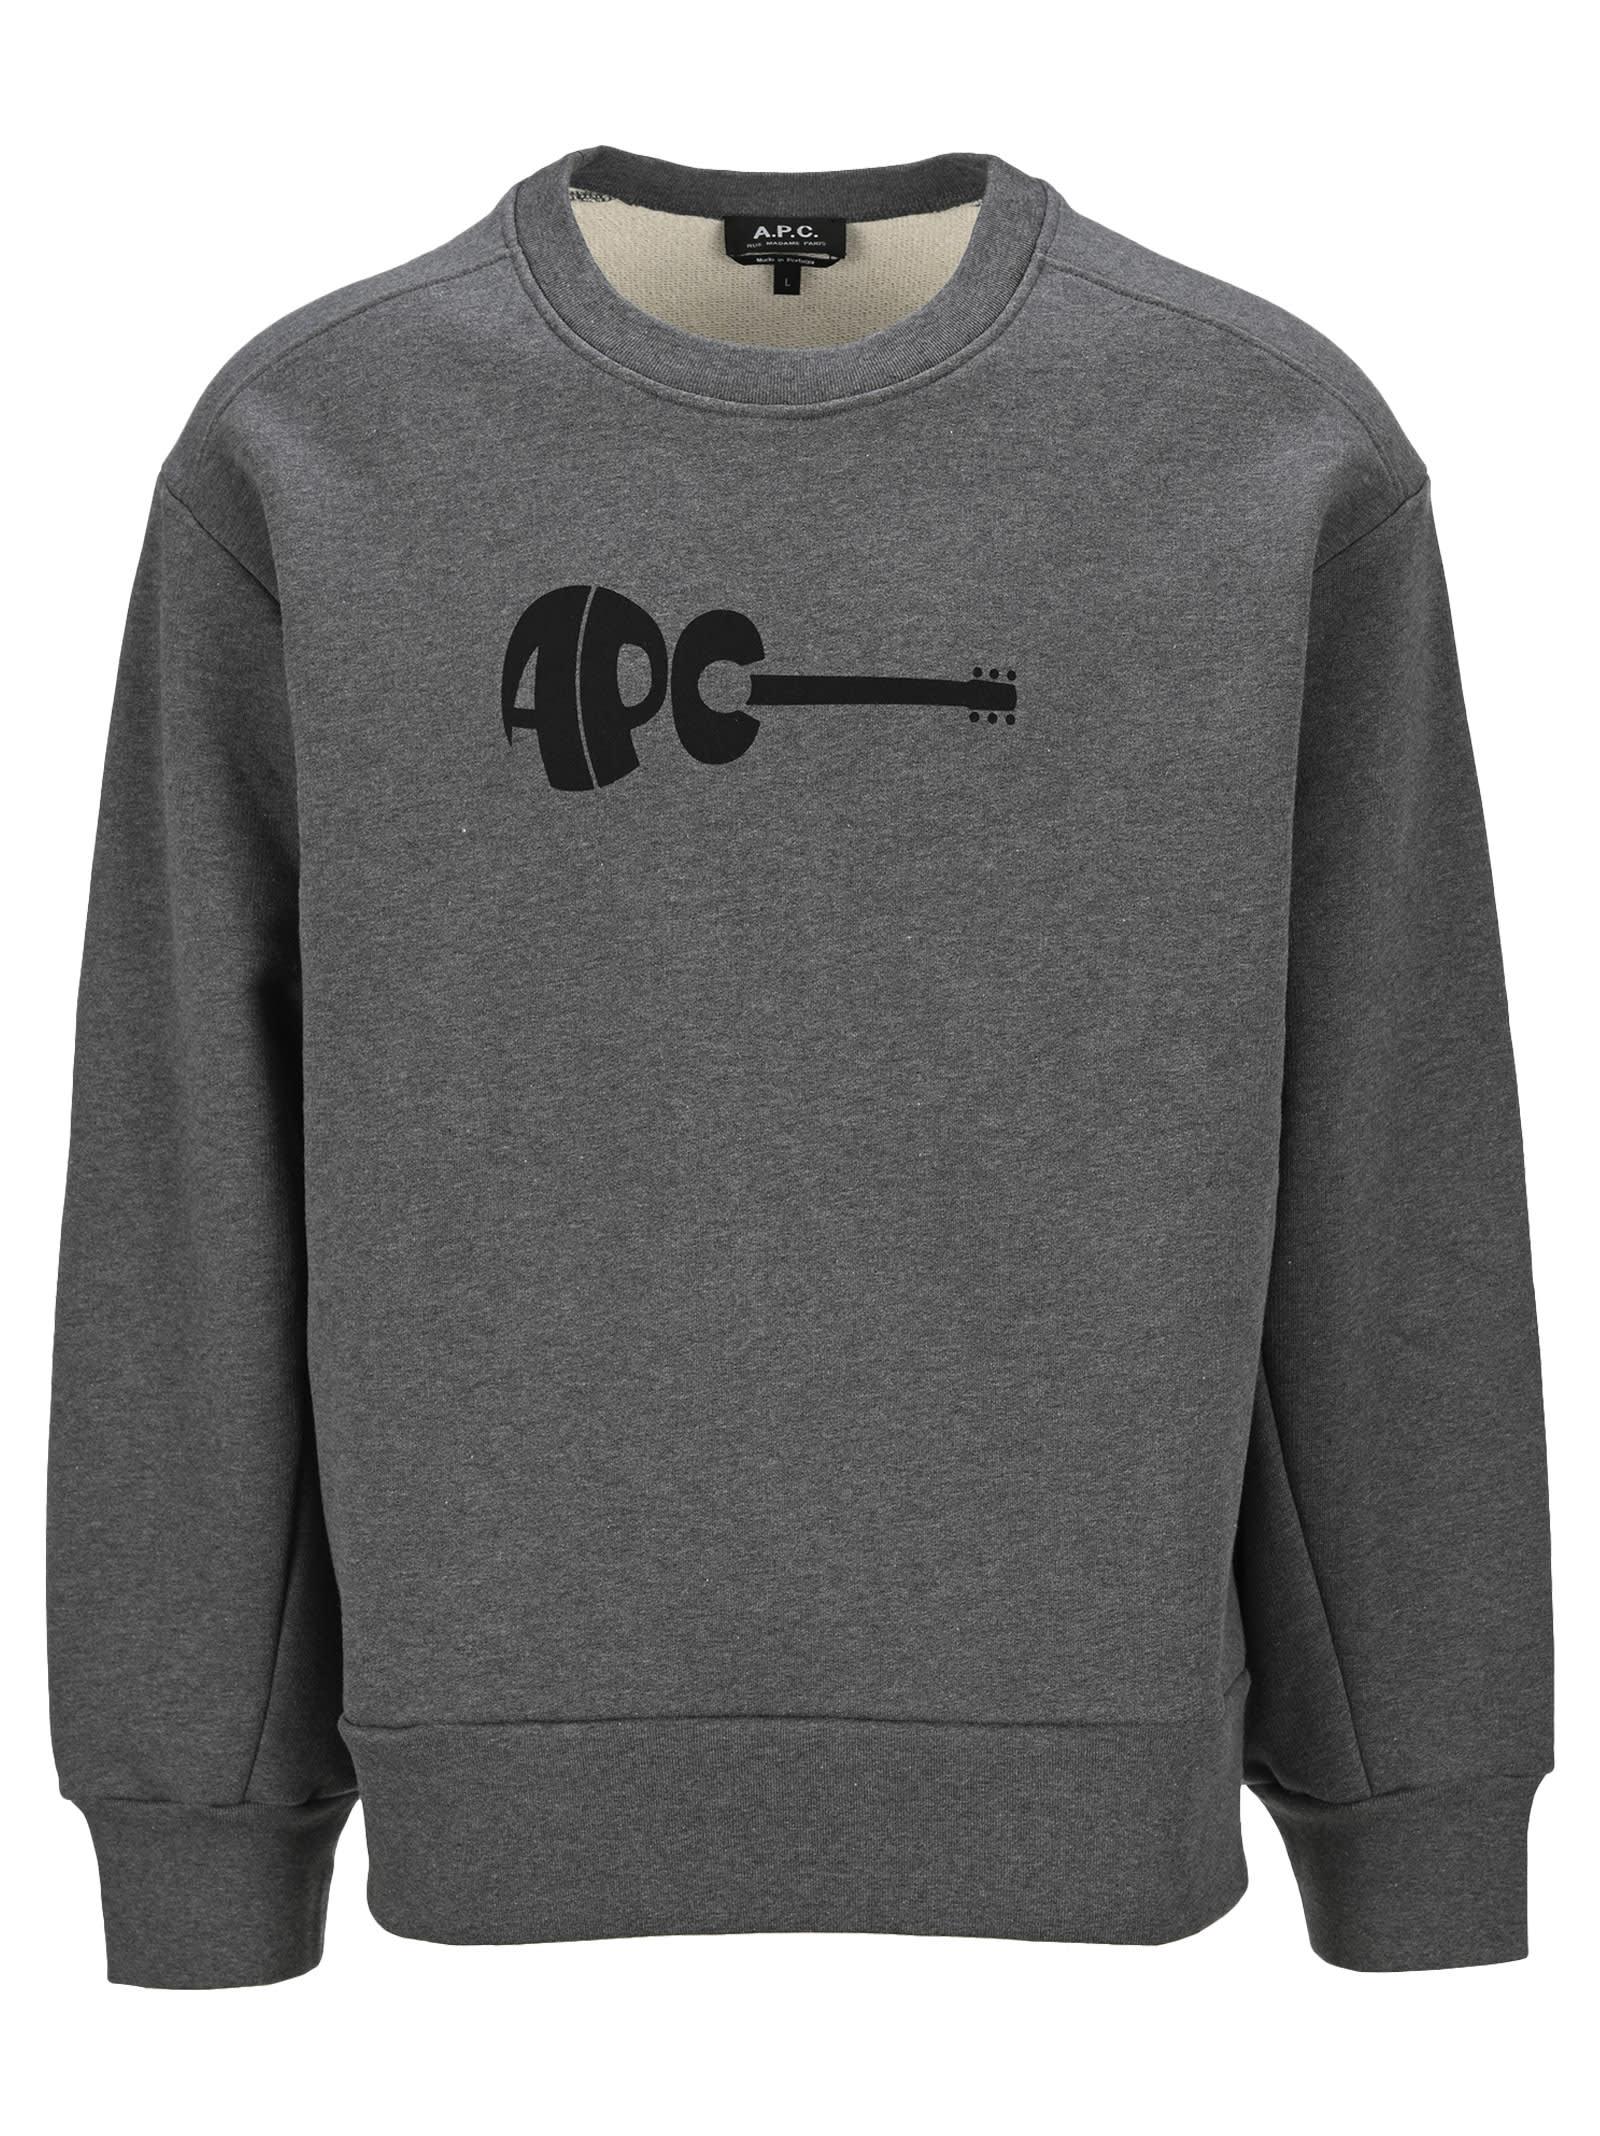 A.p.c. Guitar Crewneck Swetshirt In Dark Grey Mel